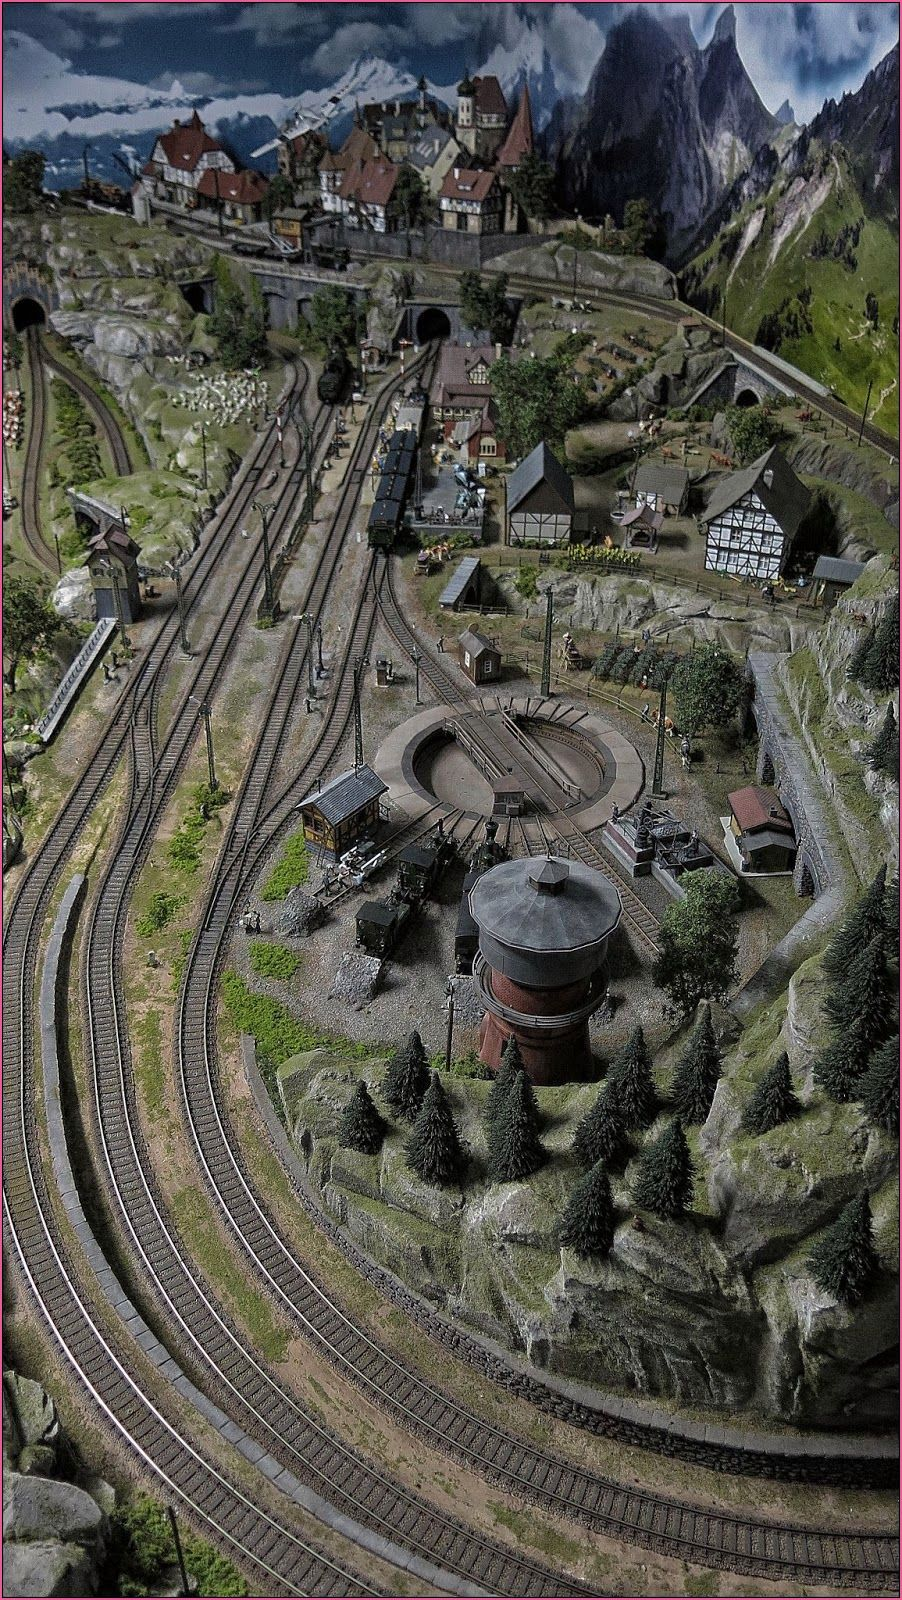 DIY Granular Licht Grün Laub Modelle Scenic Material Eisenbahn Dekoration